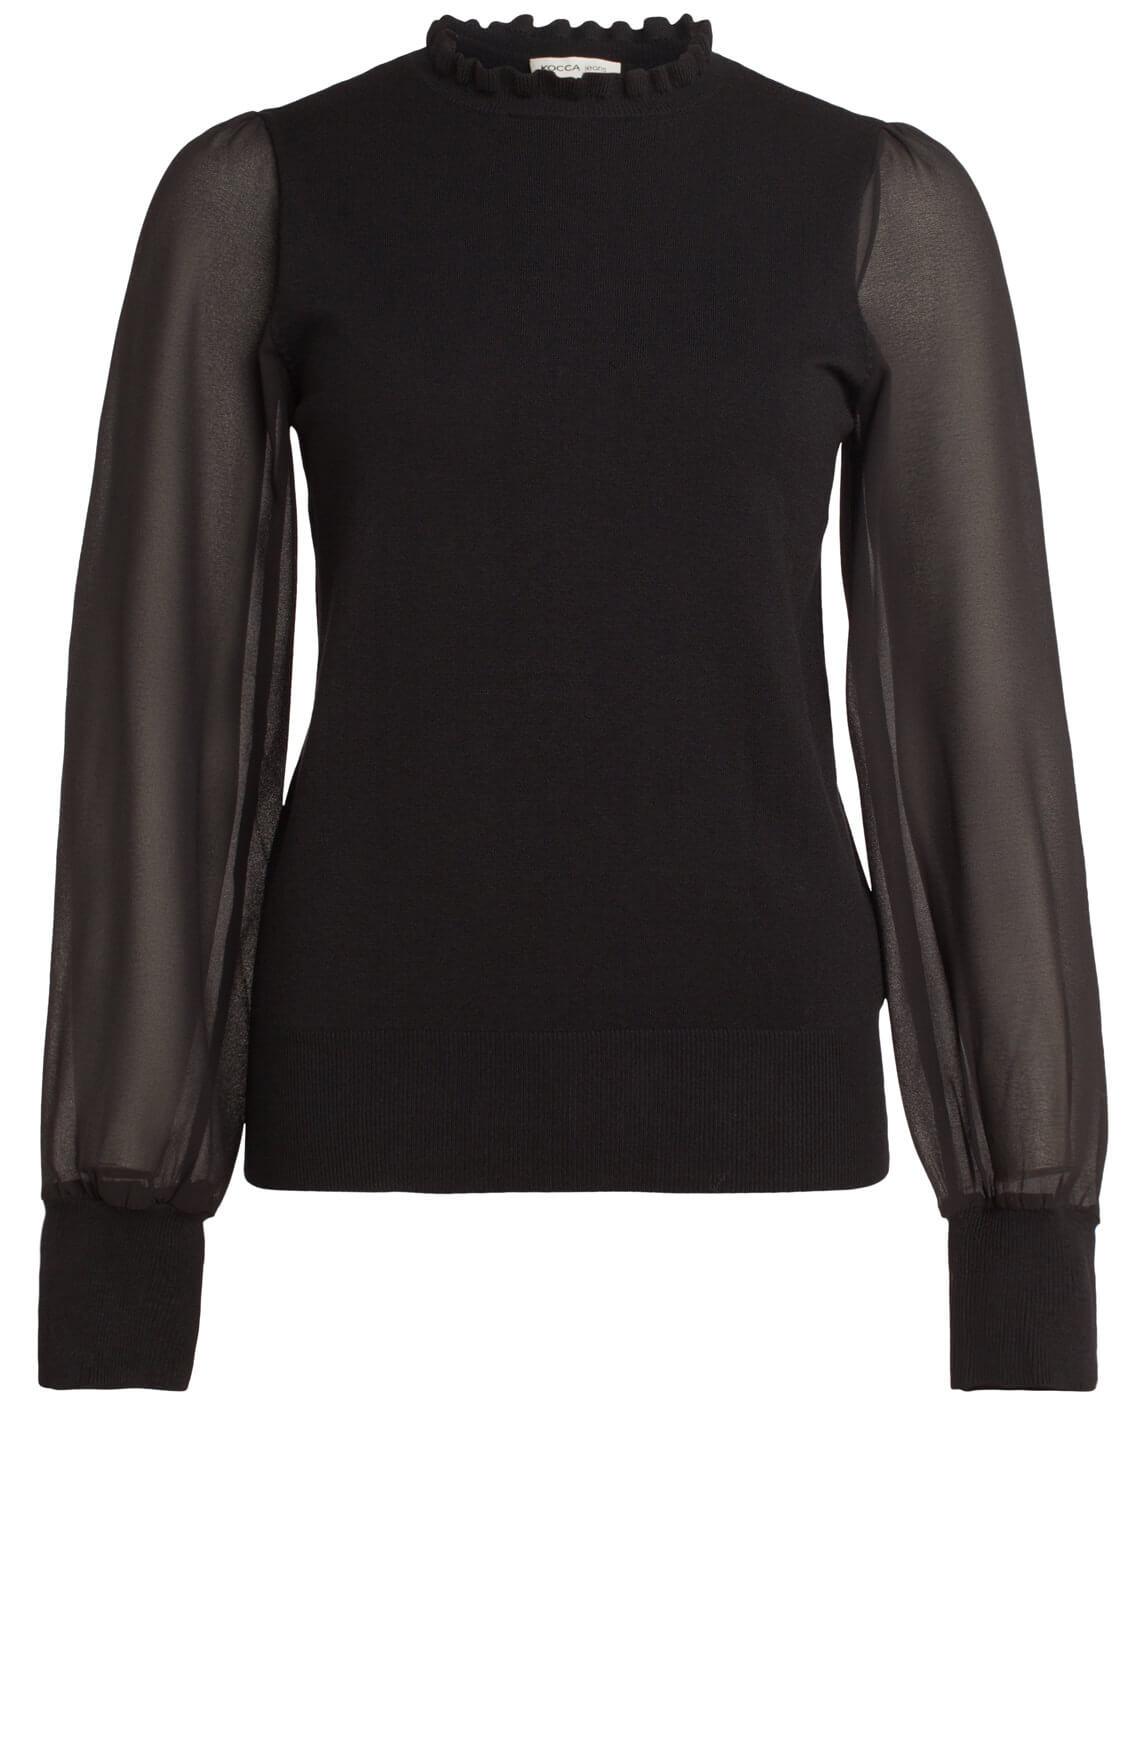 Kocca Dames Golia chique pullover zwart